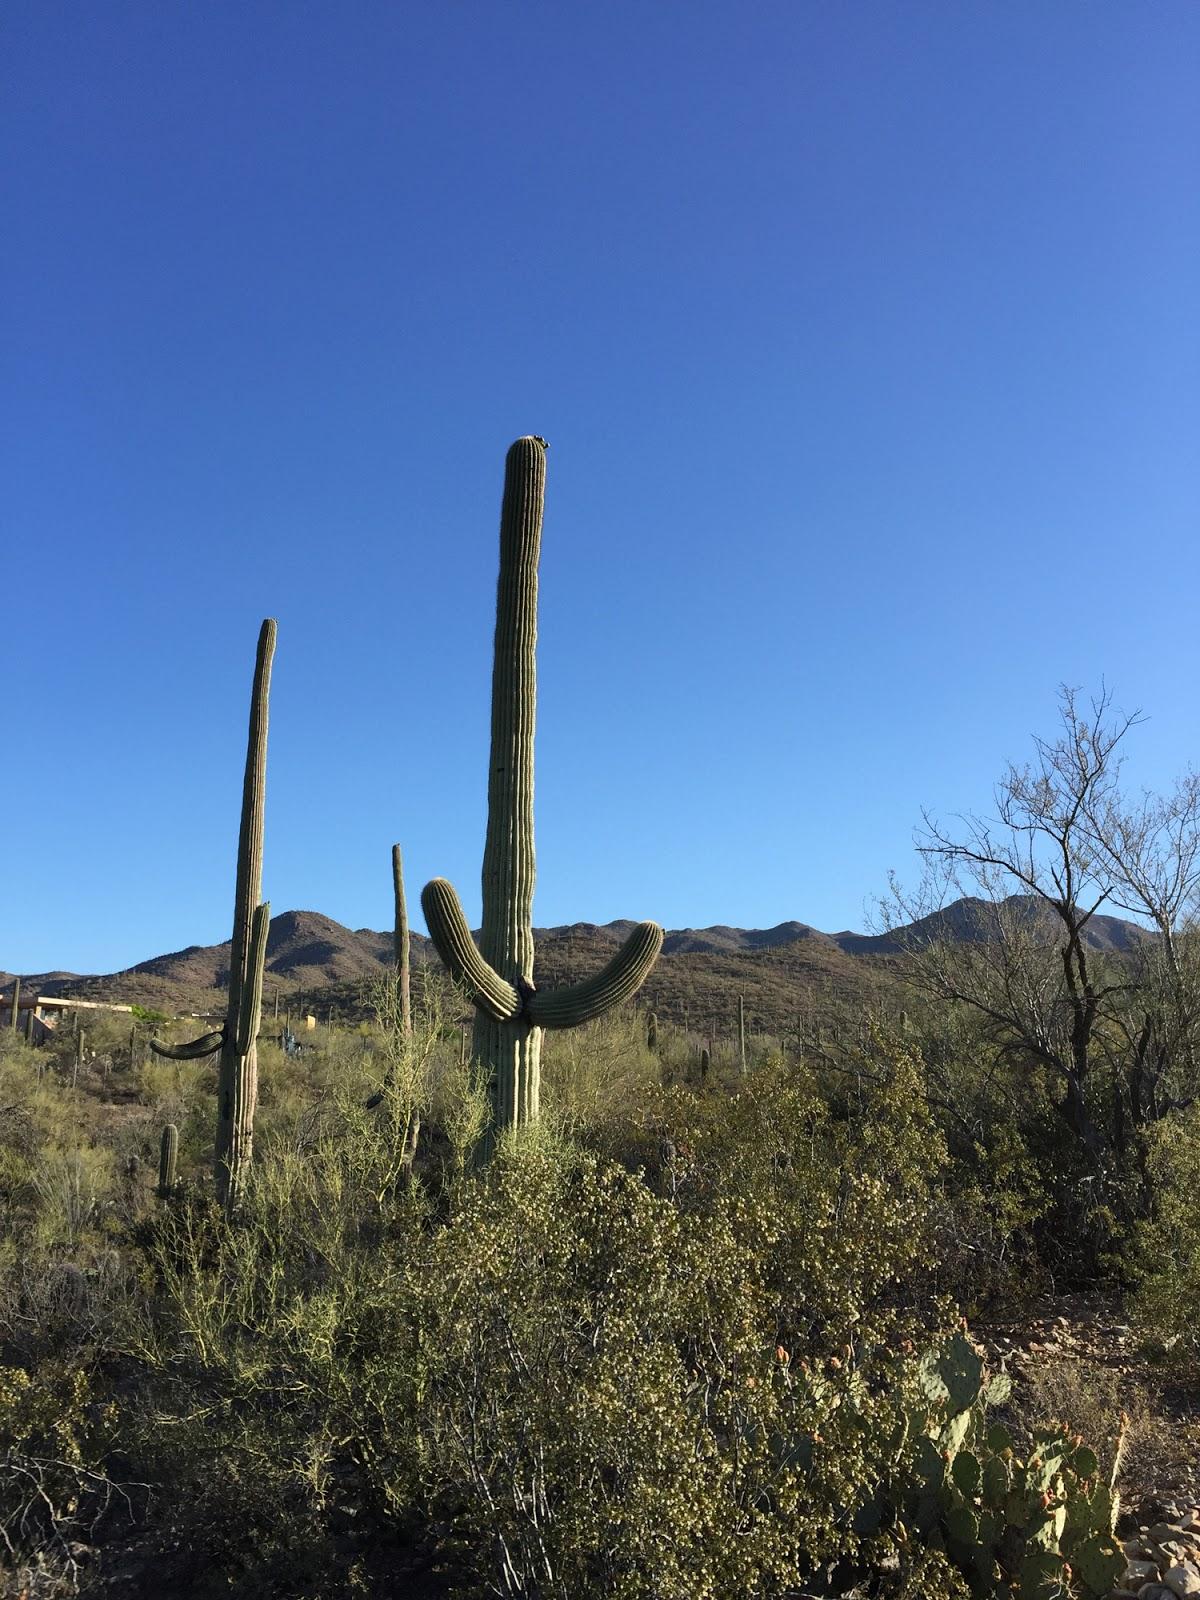 ZOOTHERA BIRDING BLOG Arizona Day 2 Sonoran Desert to